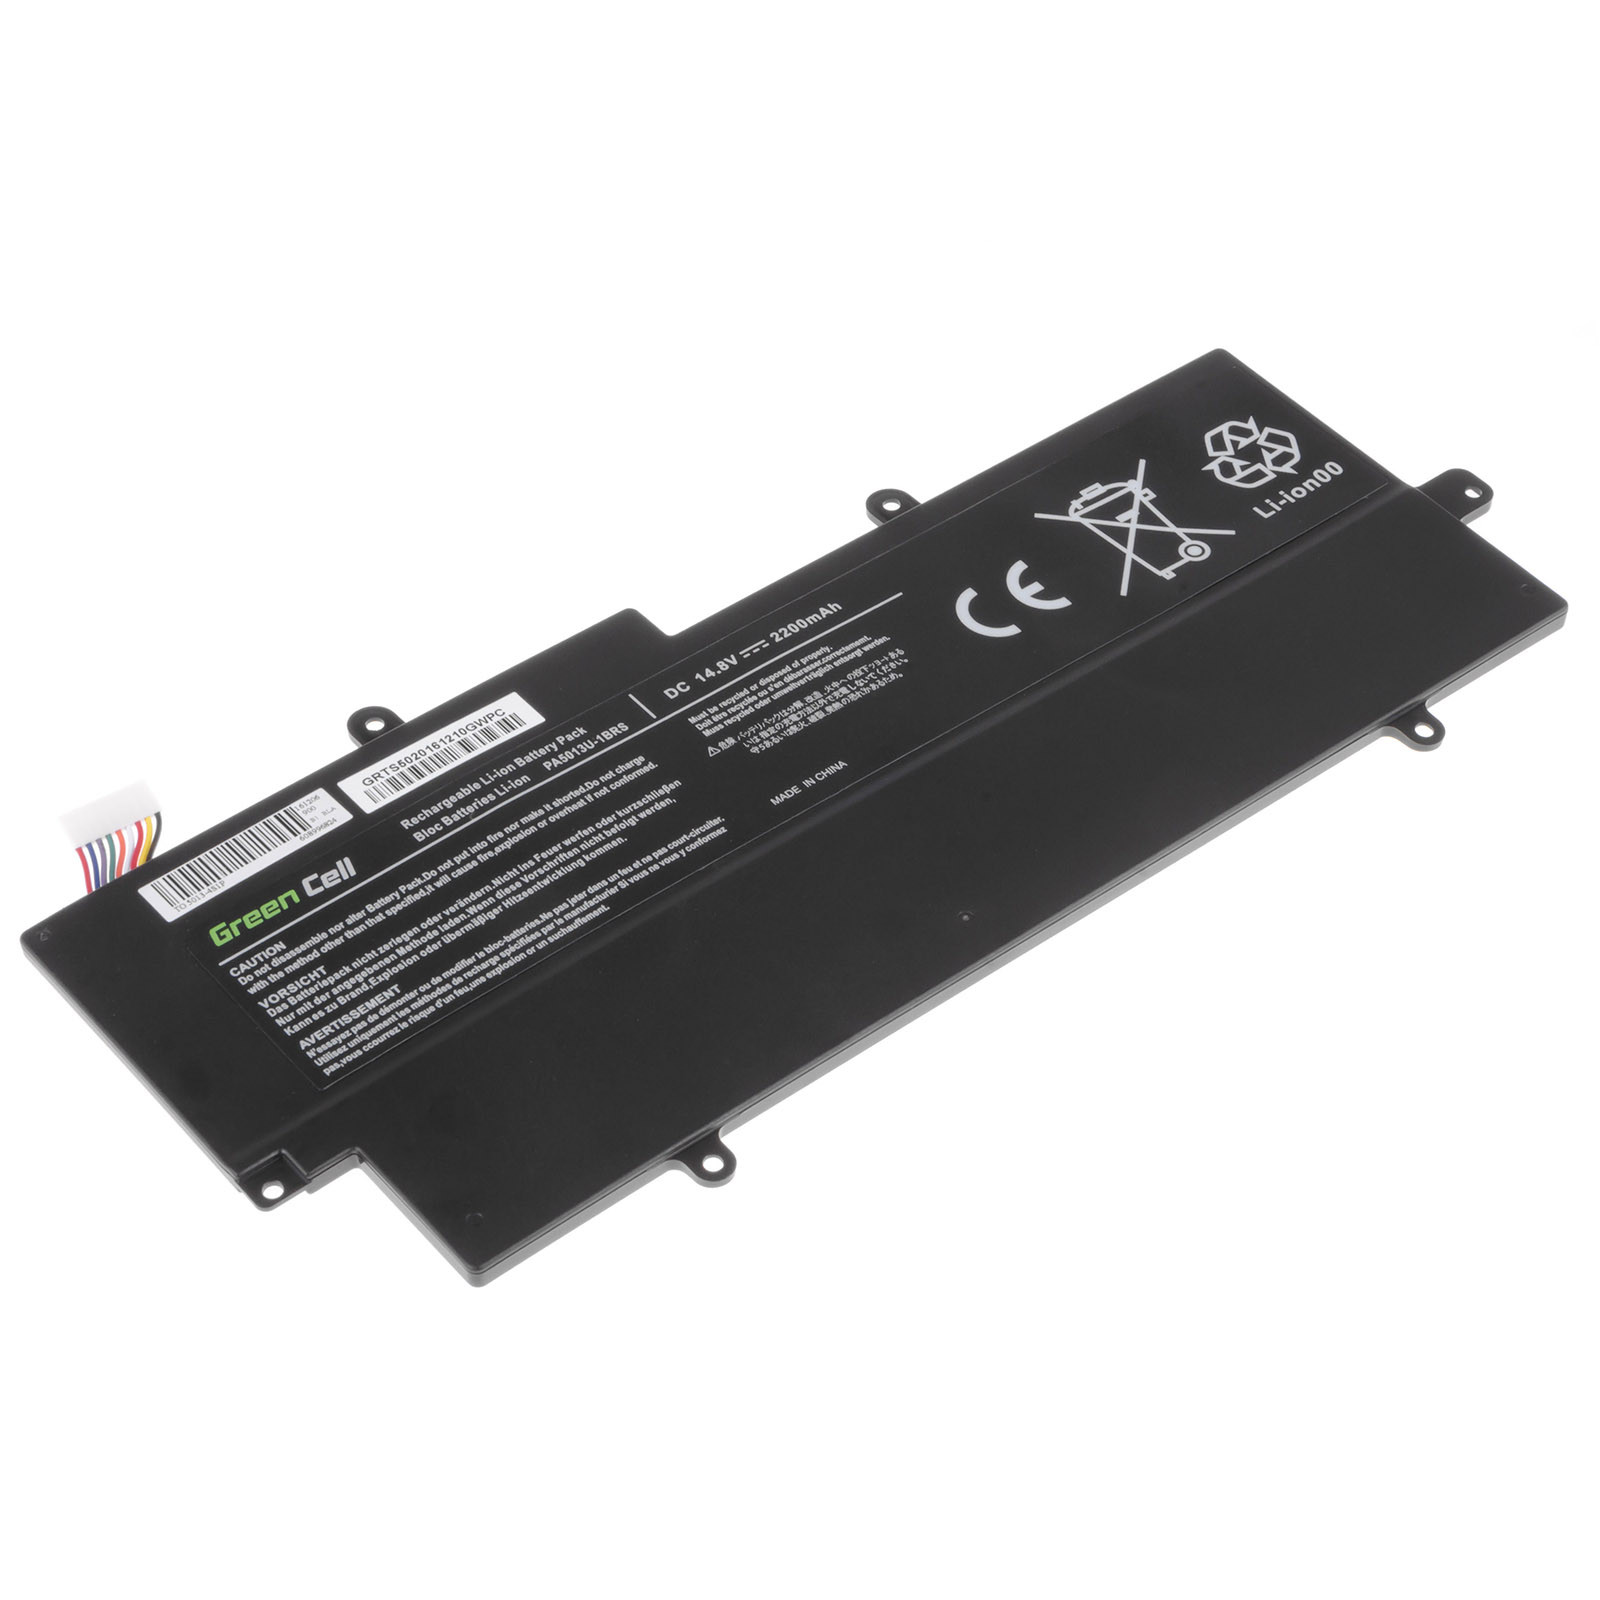 Green Cell Baterie pro Toshiba Portege Z830 Z835 Z930 Z935 / 14,4V 2200mAh